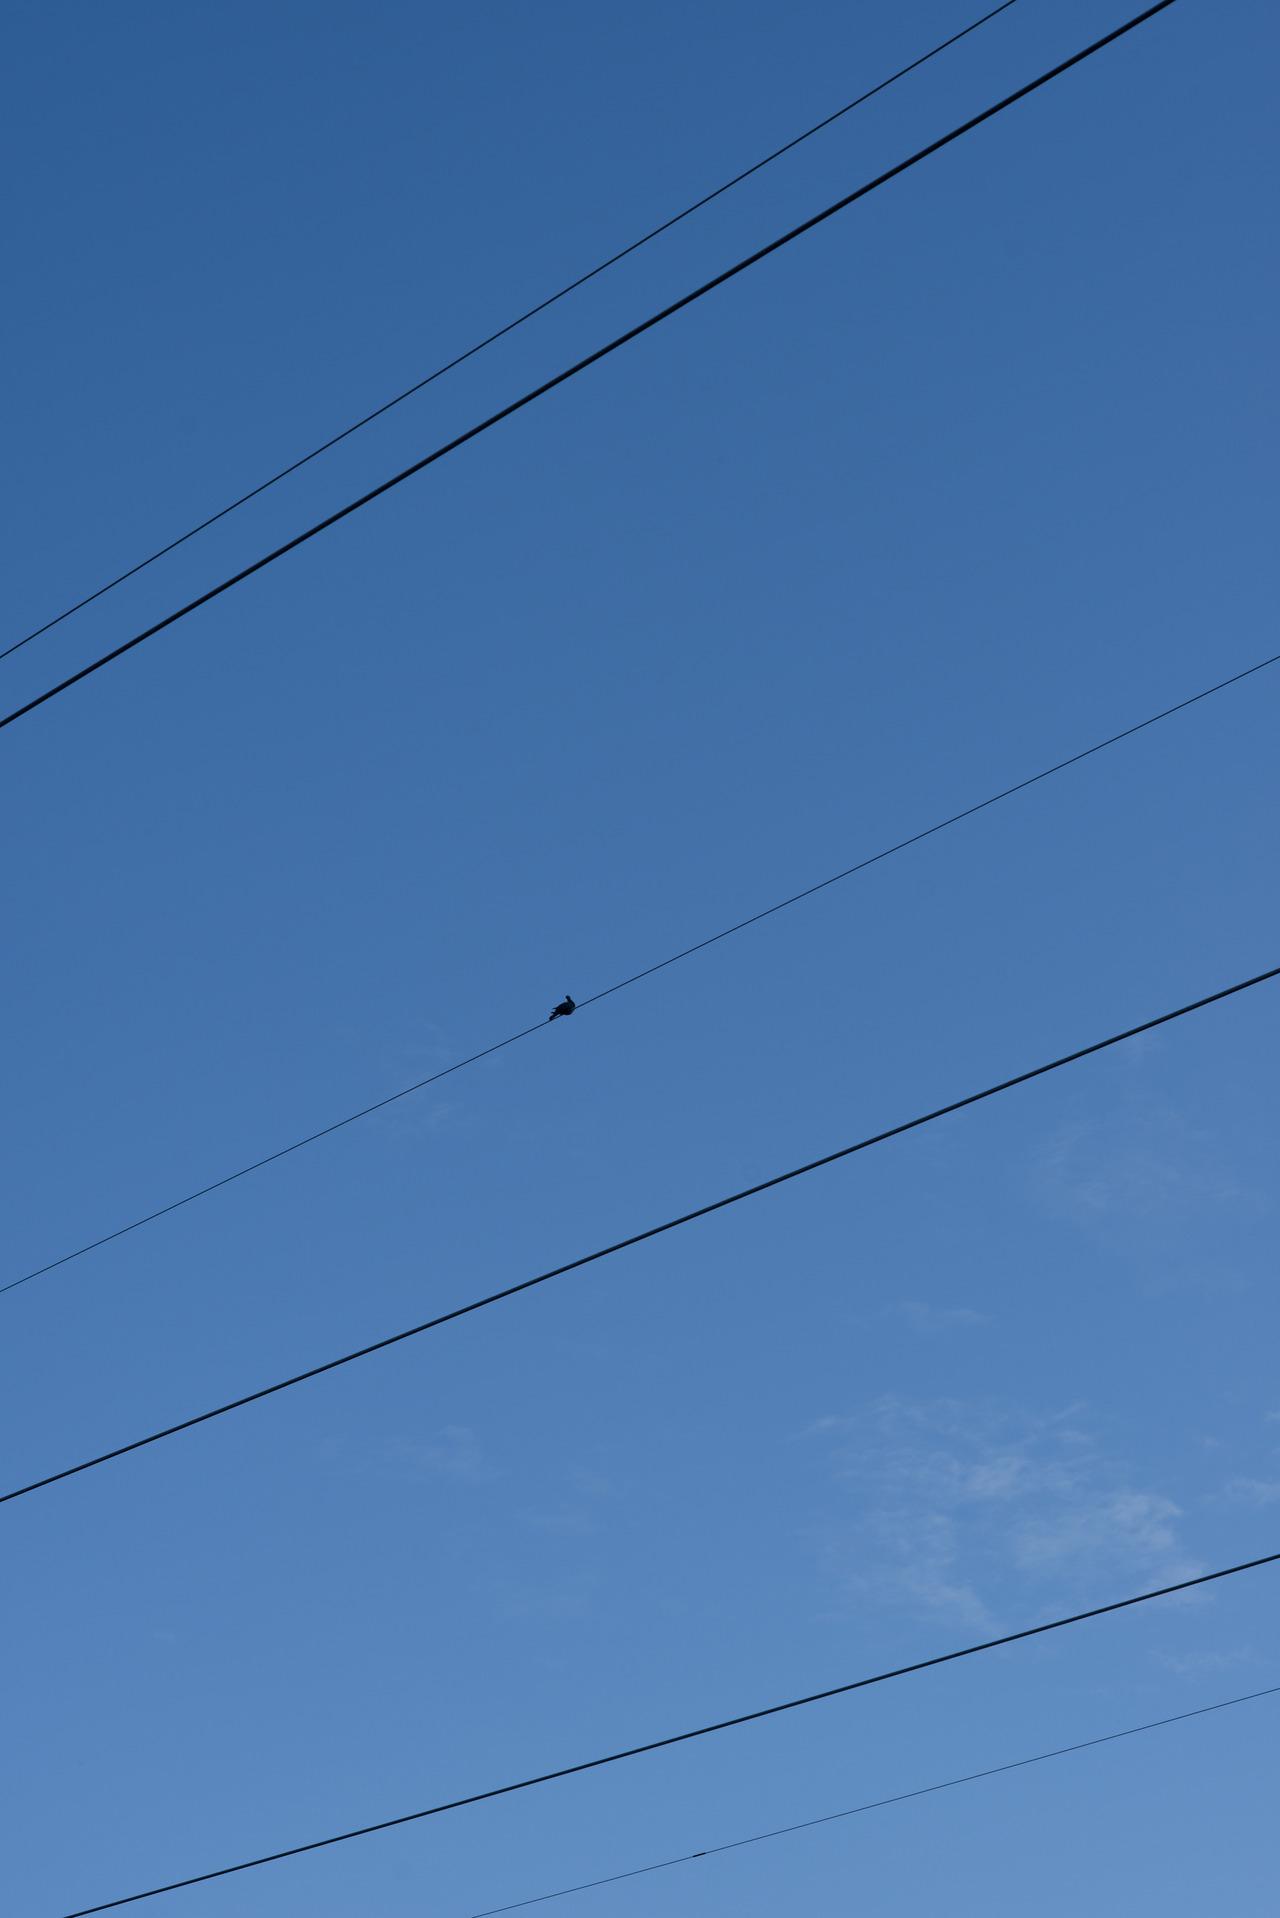 Pigeon, 200/366.